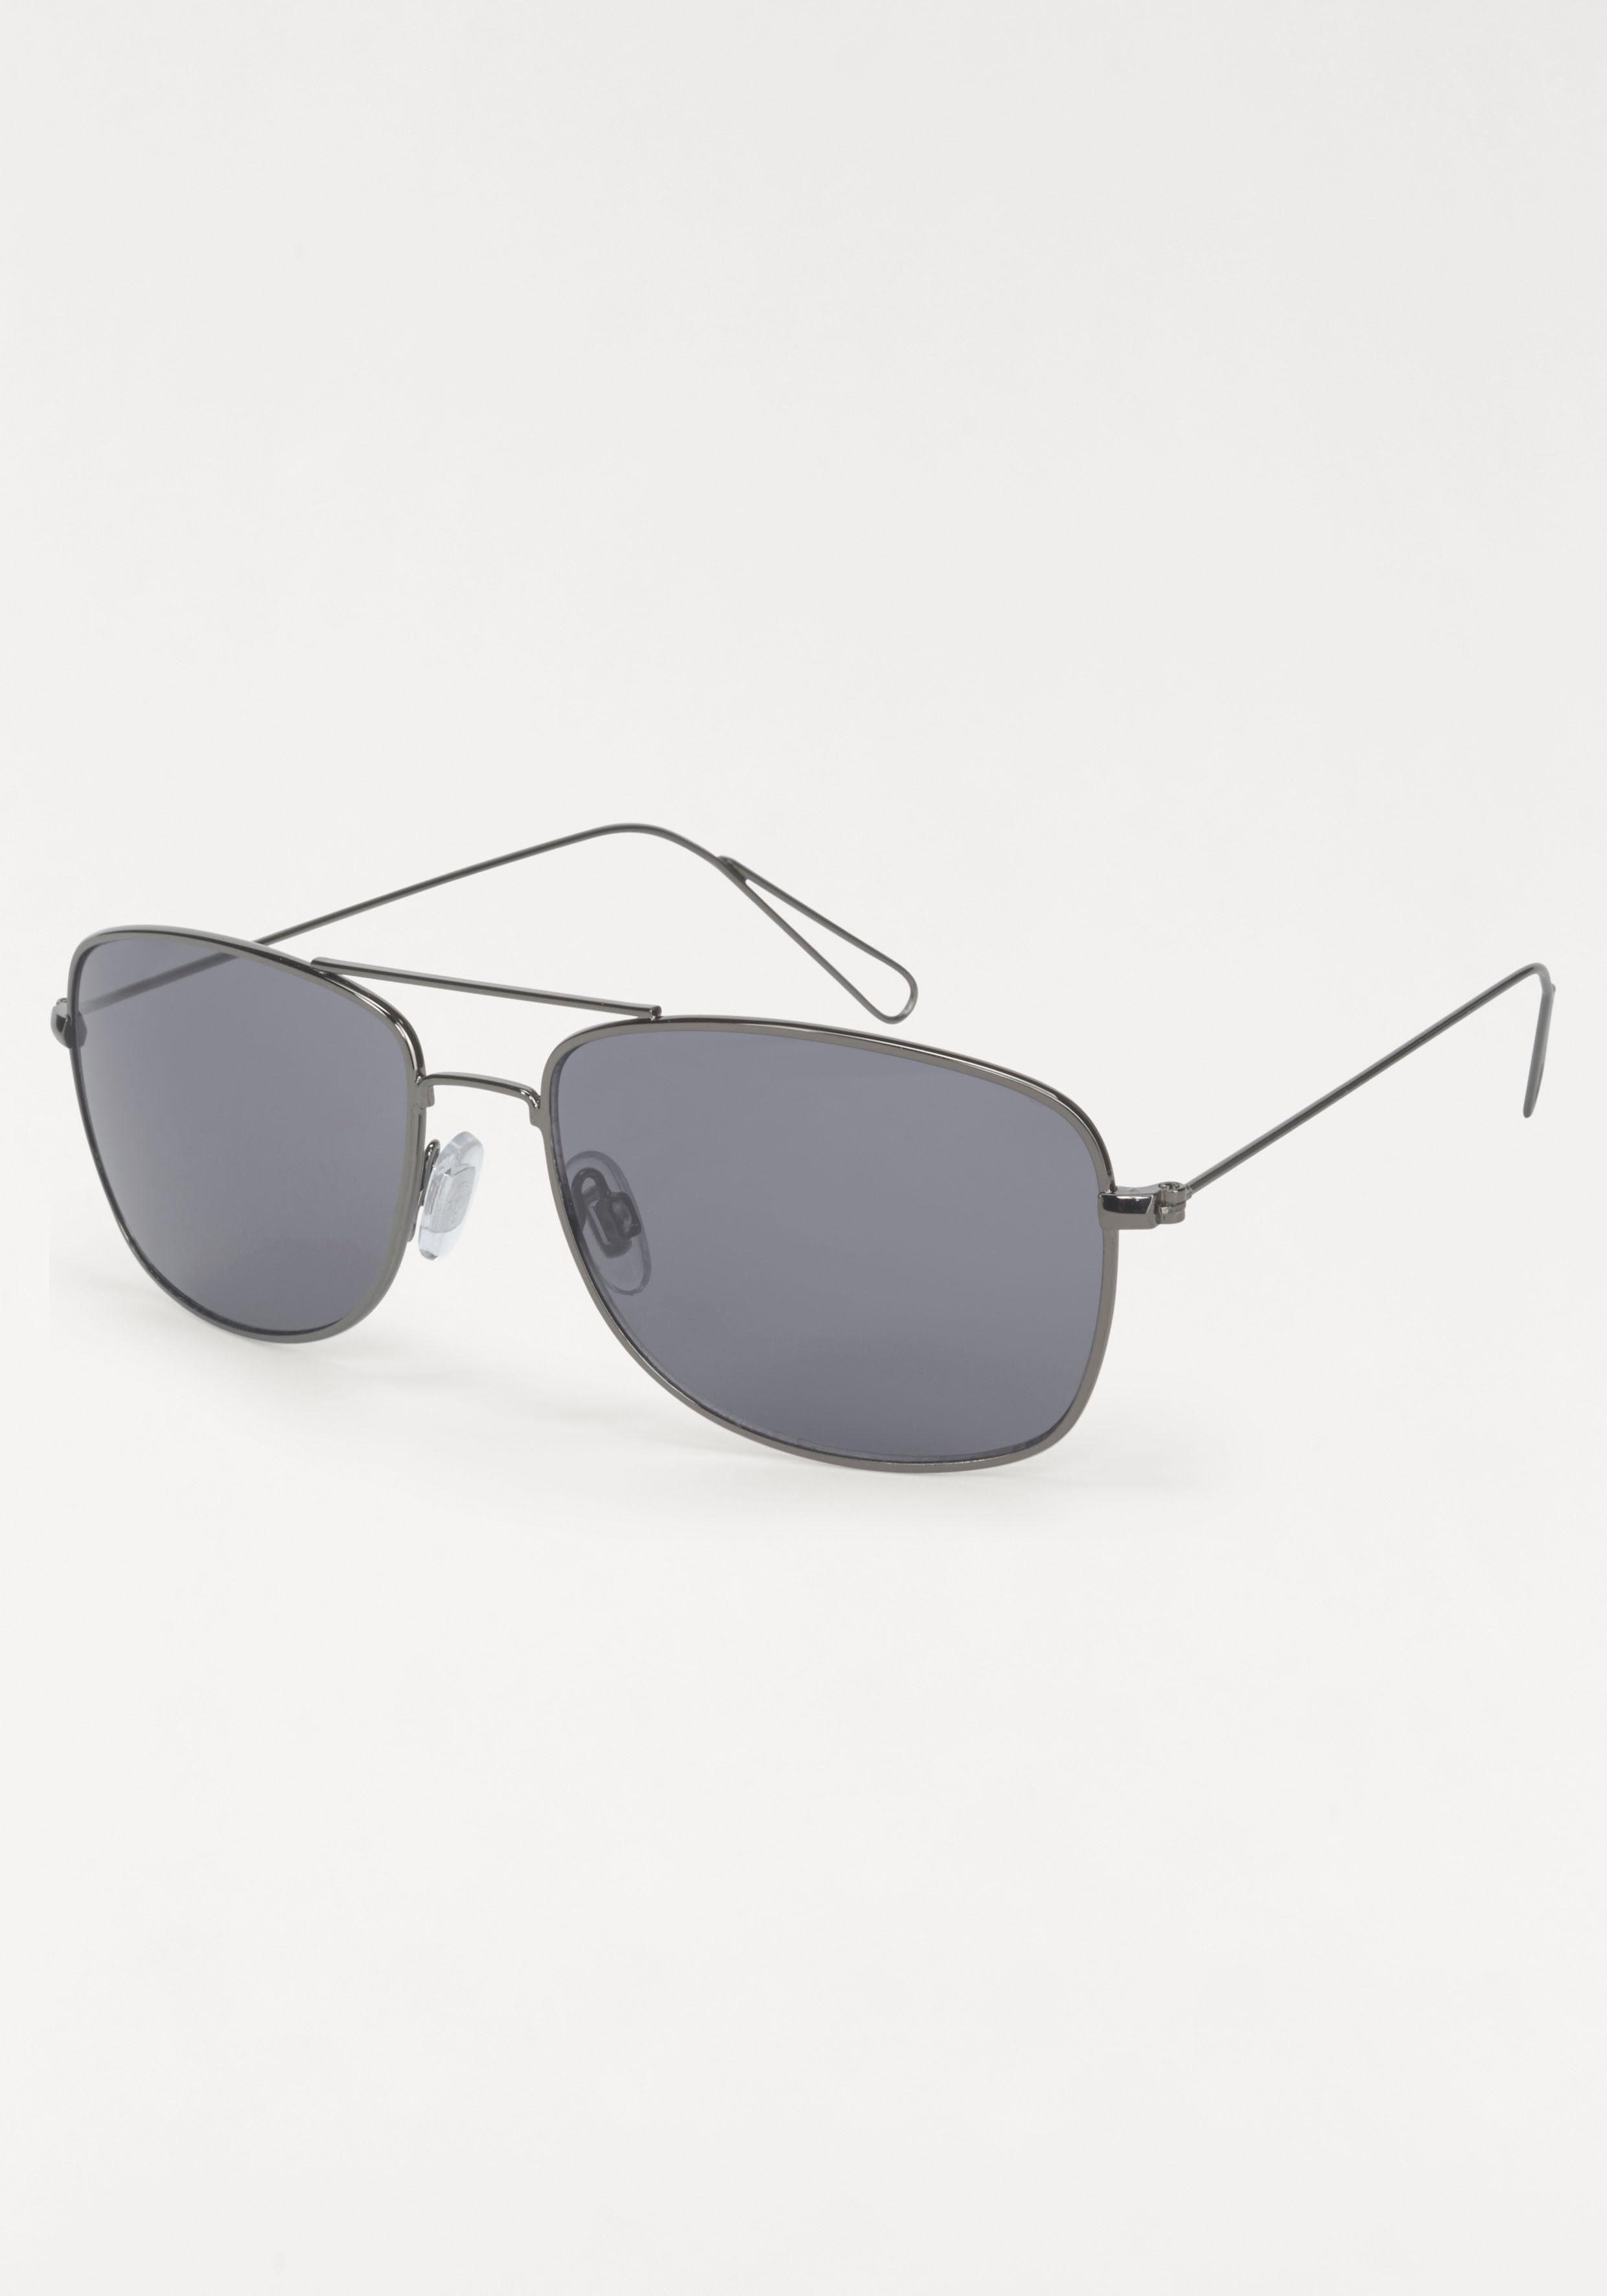 Gin Tonic Sonnenbrille, im sportiven Design